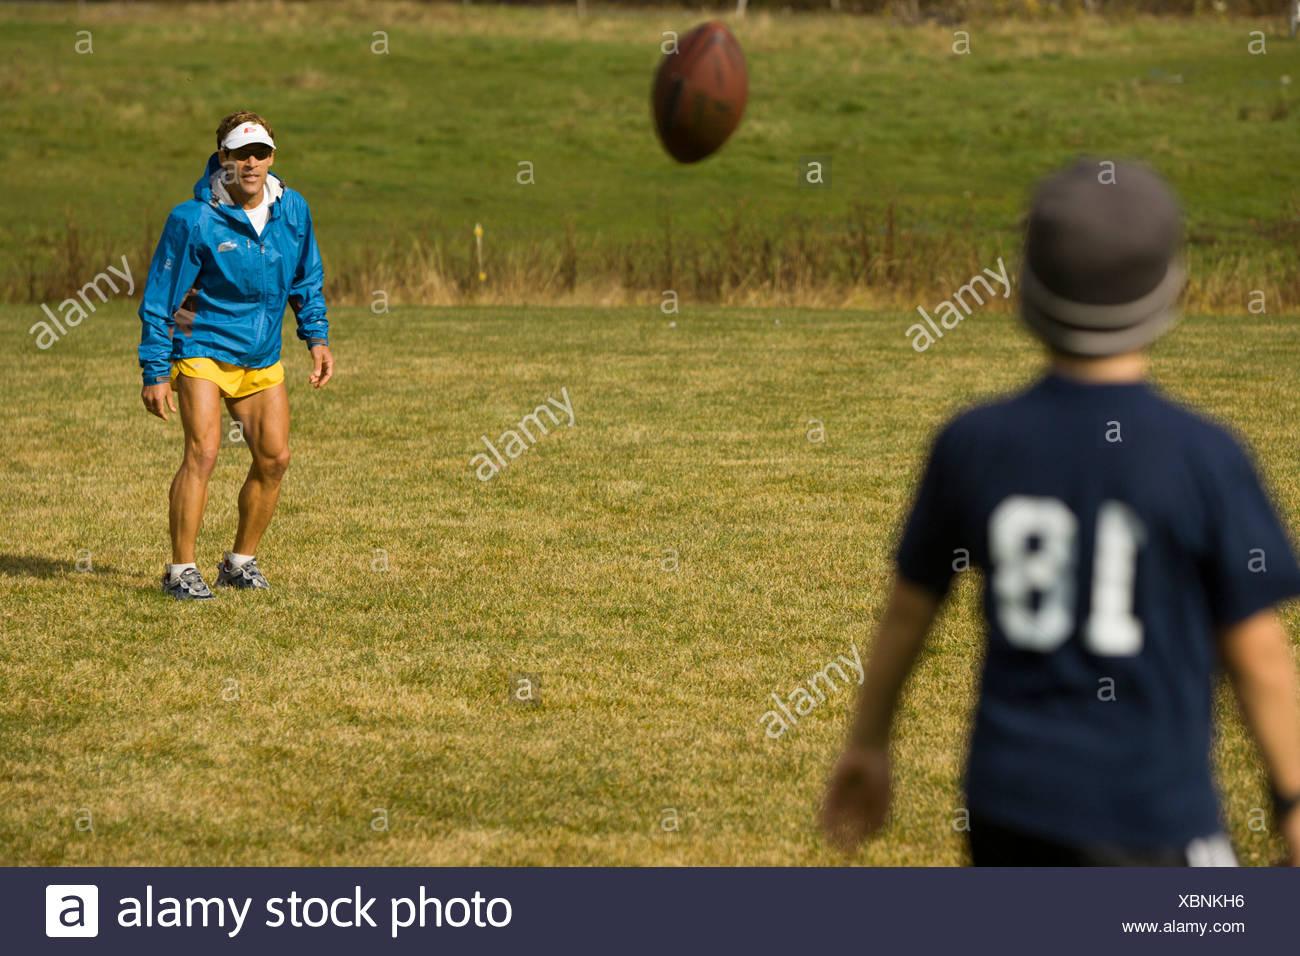 Man throwing a football avec son fils à Stowe, au Vermont. Photo Stock